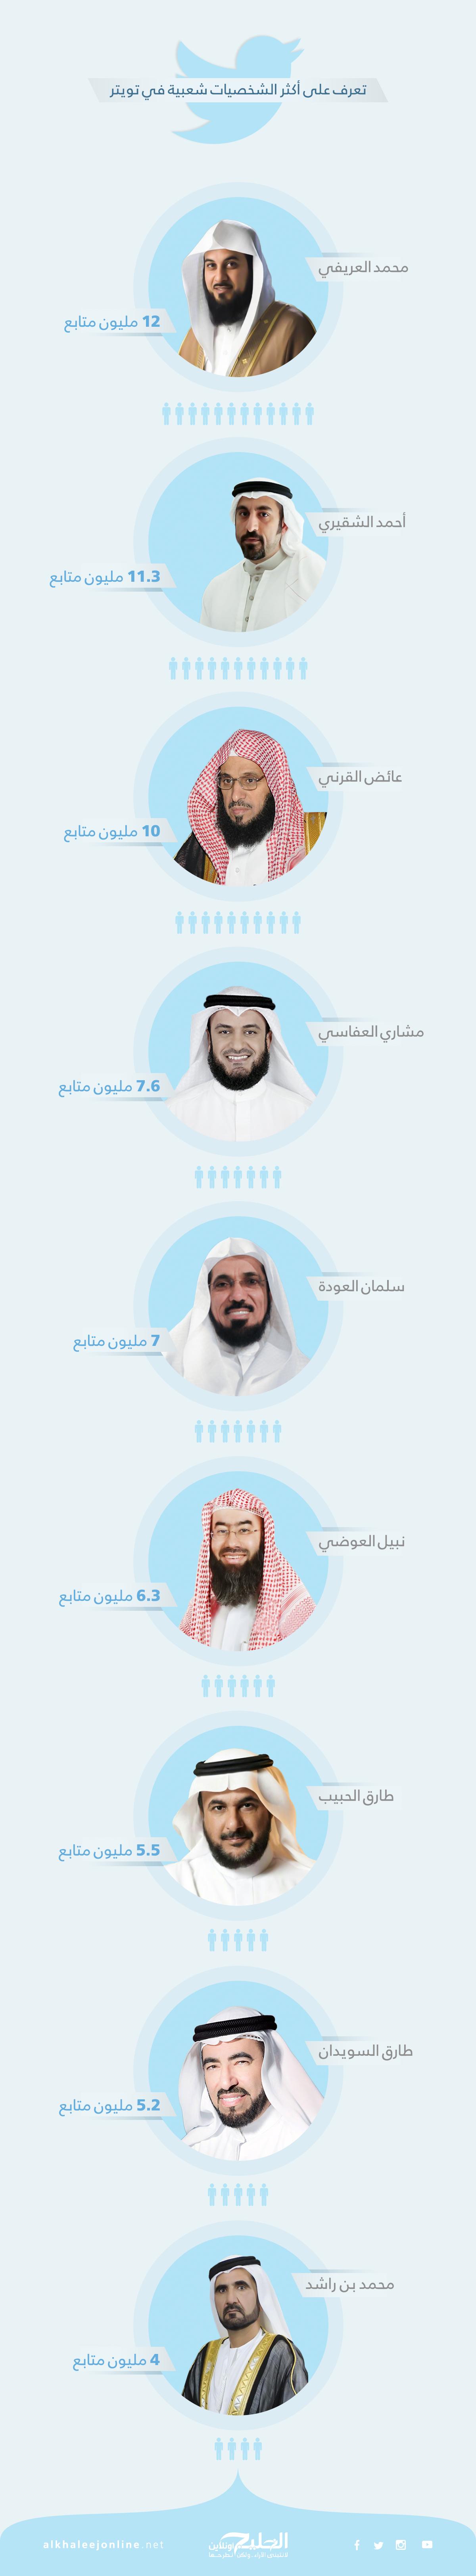 شخصيات-متابعين-تويتر (1)